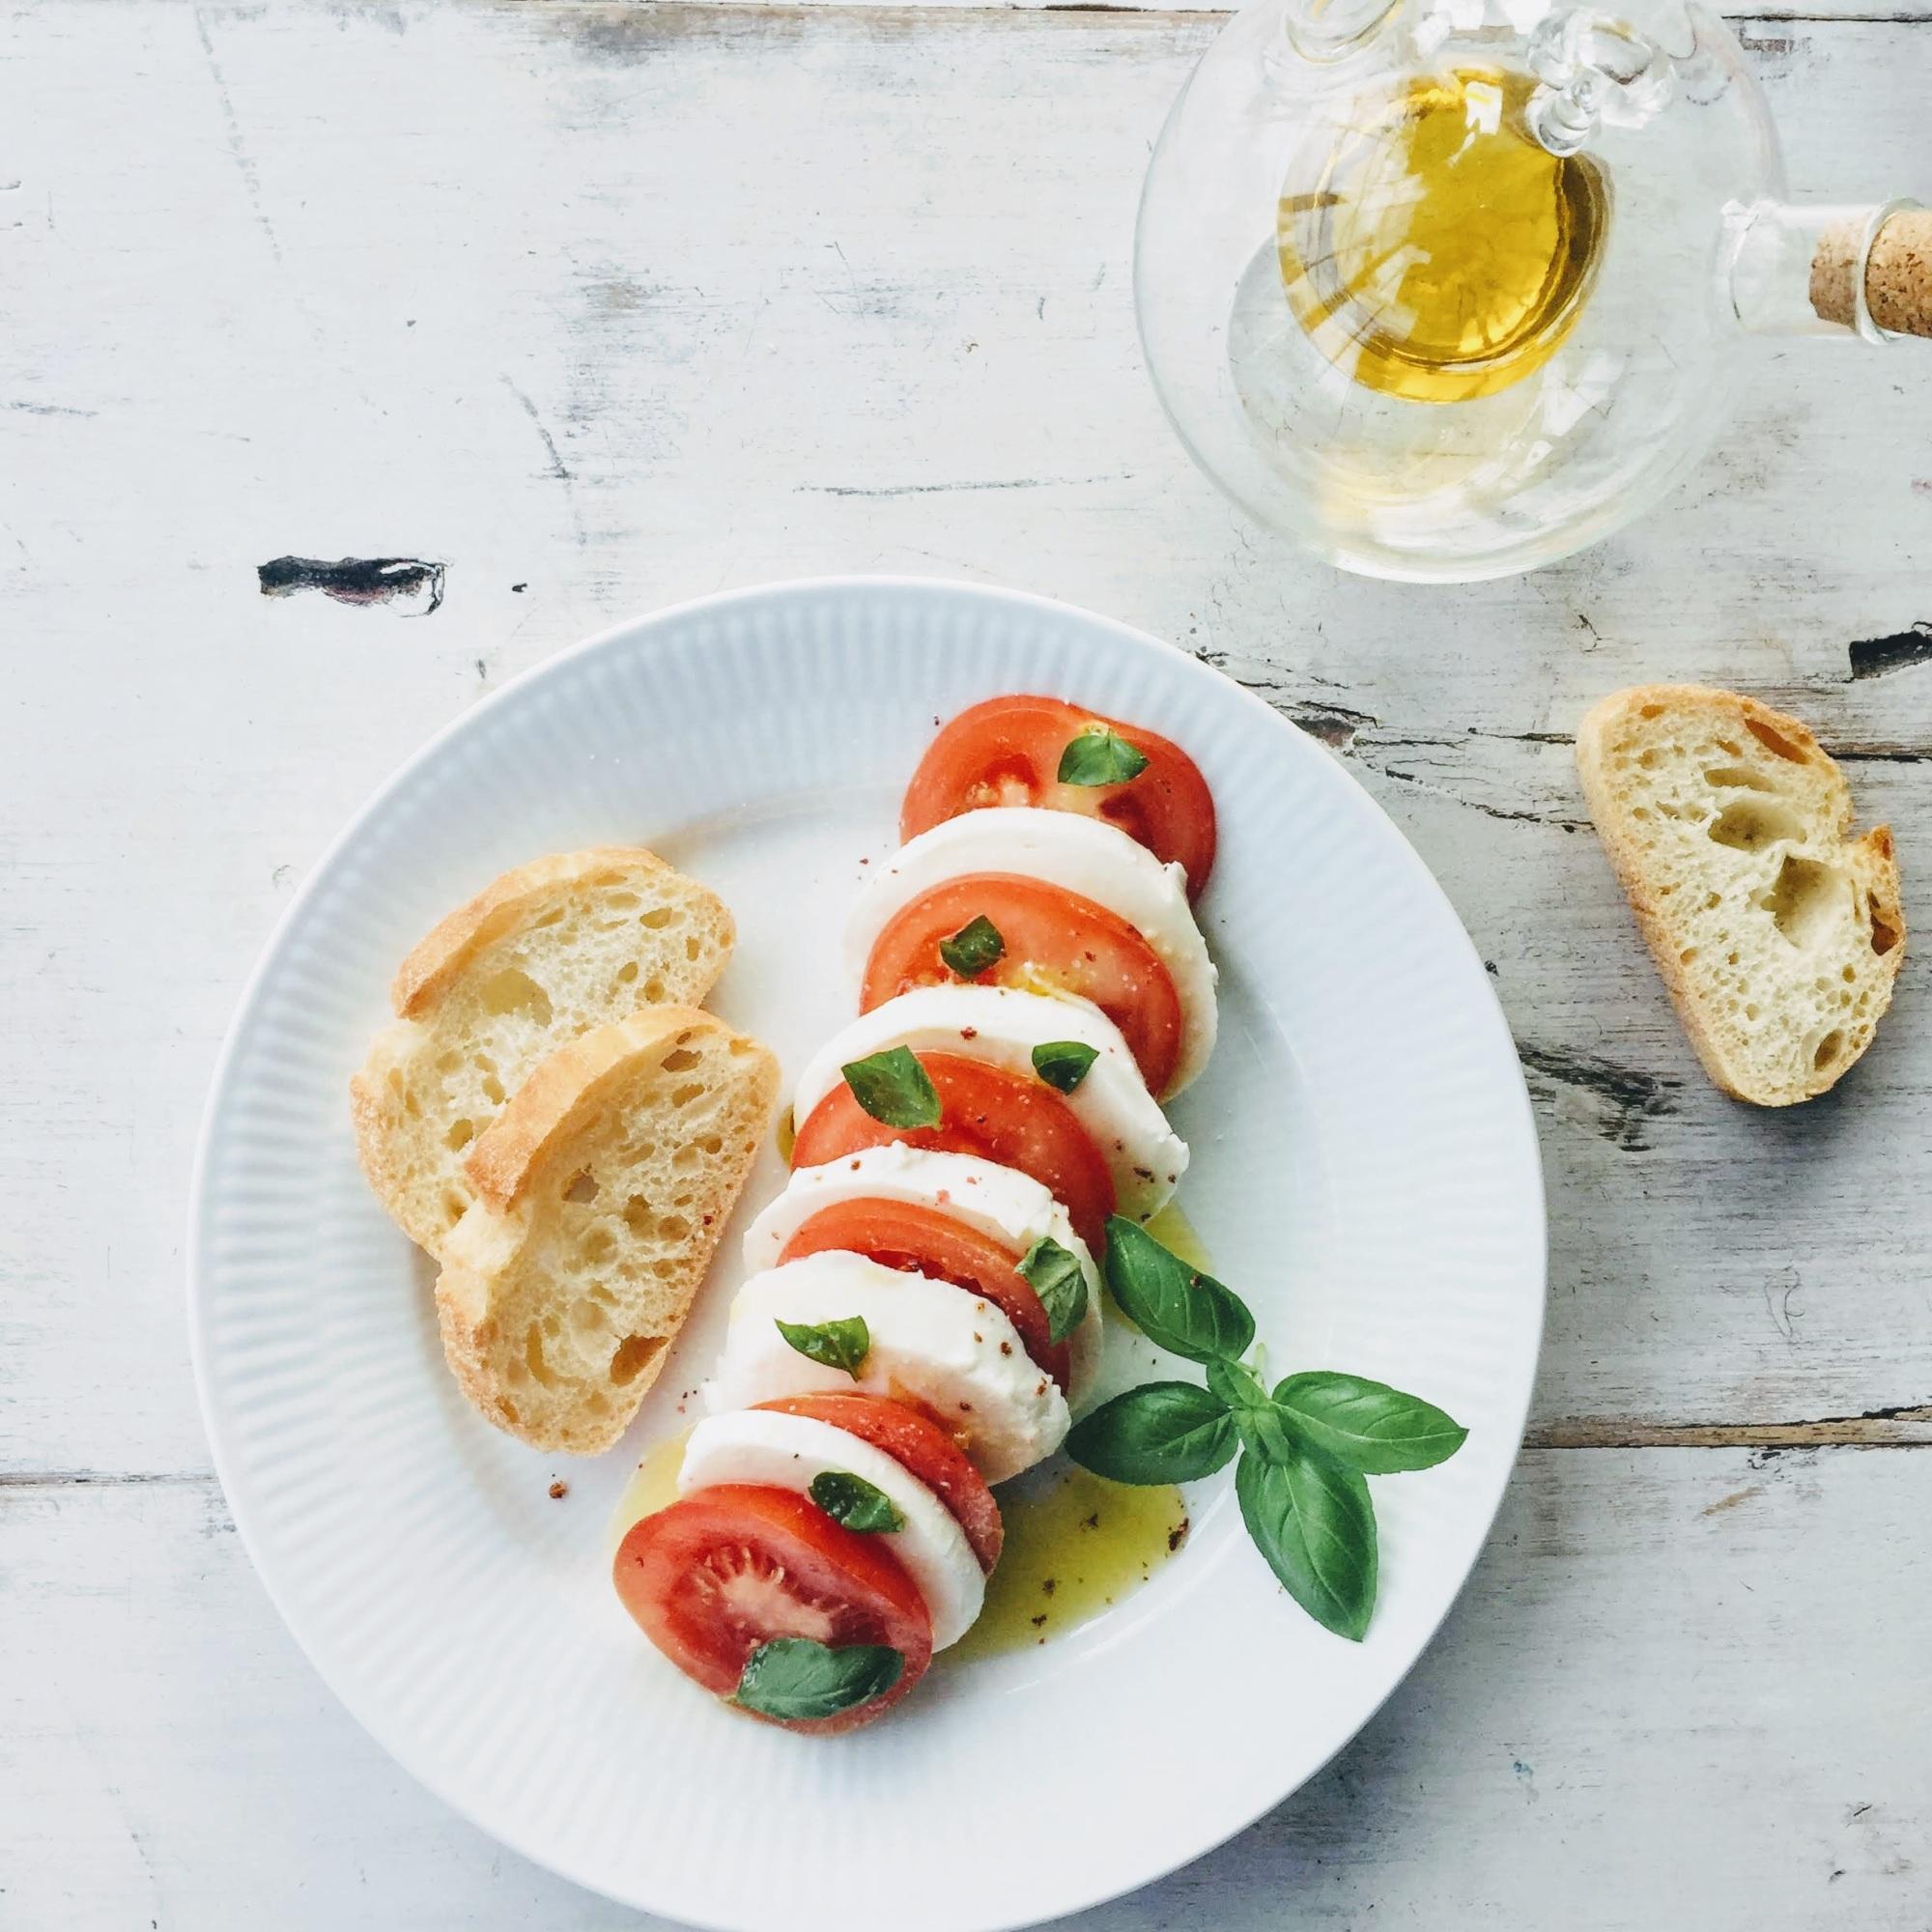 Caprese Salad -Tomatoes Mozzarella Basil Leaves Evo Oil